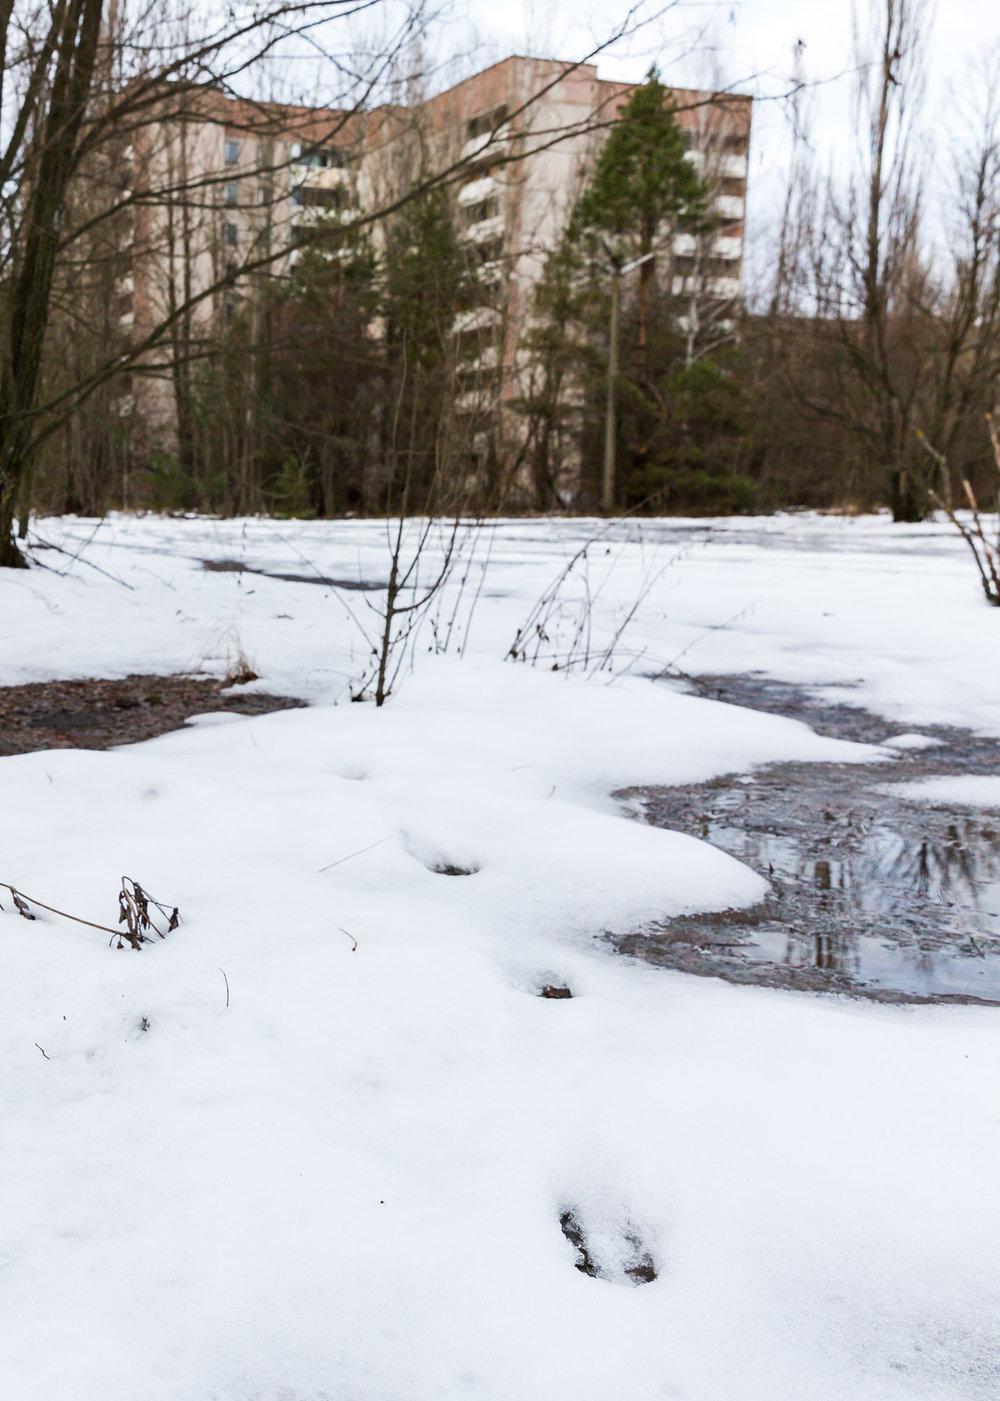 2017_01_02_ben_kepka_cultured_kiwi_Ukraine_Chernobyl-19.jpg